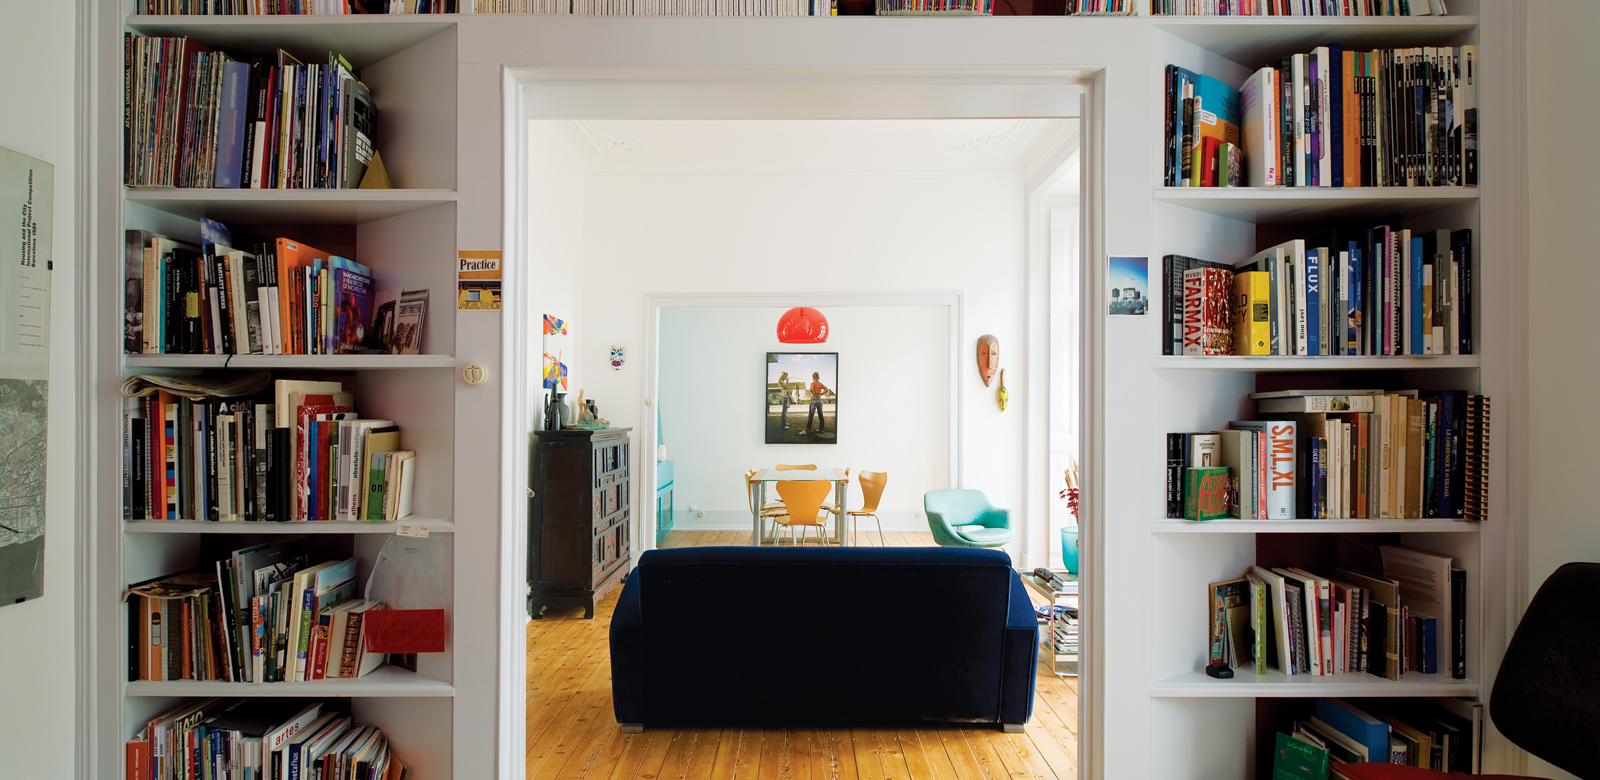 Architect and MoMA Curator Pedro Gadanho's square library